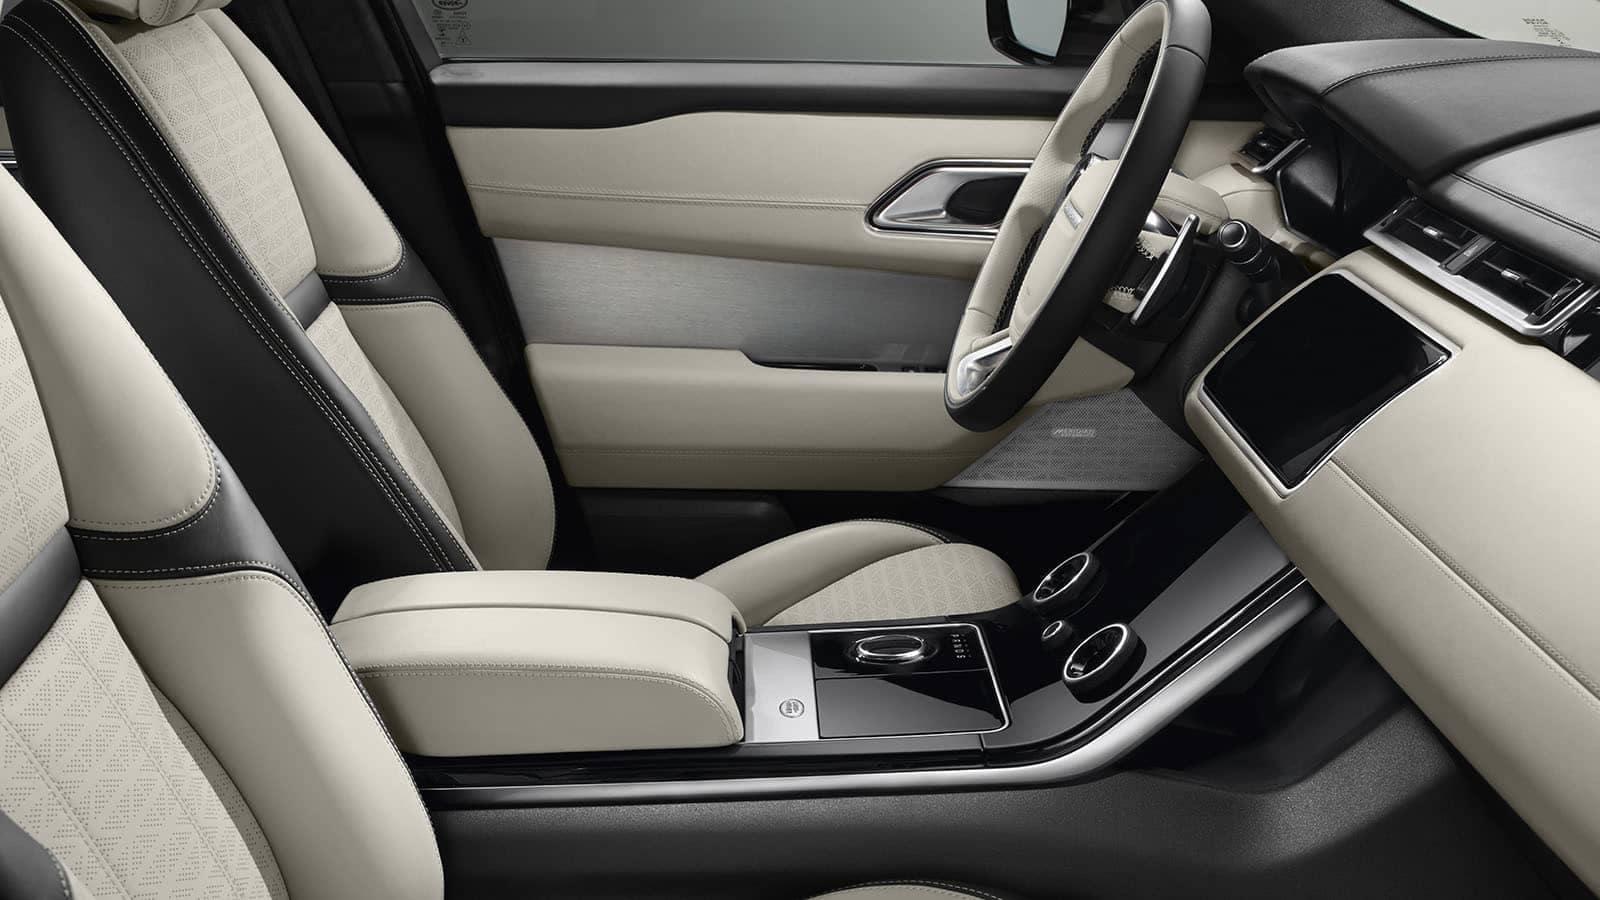 2019 Range Rover Velar Interior Front Seating